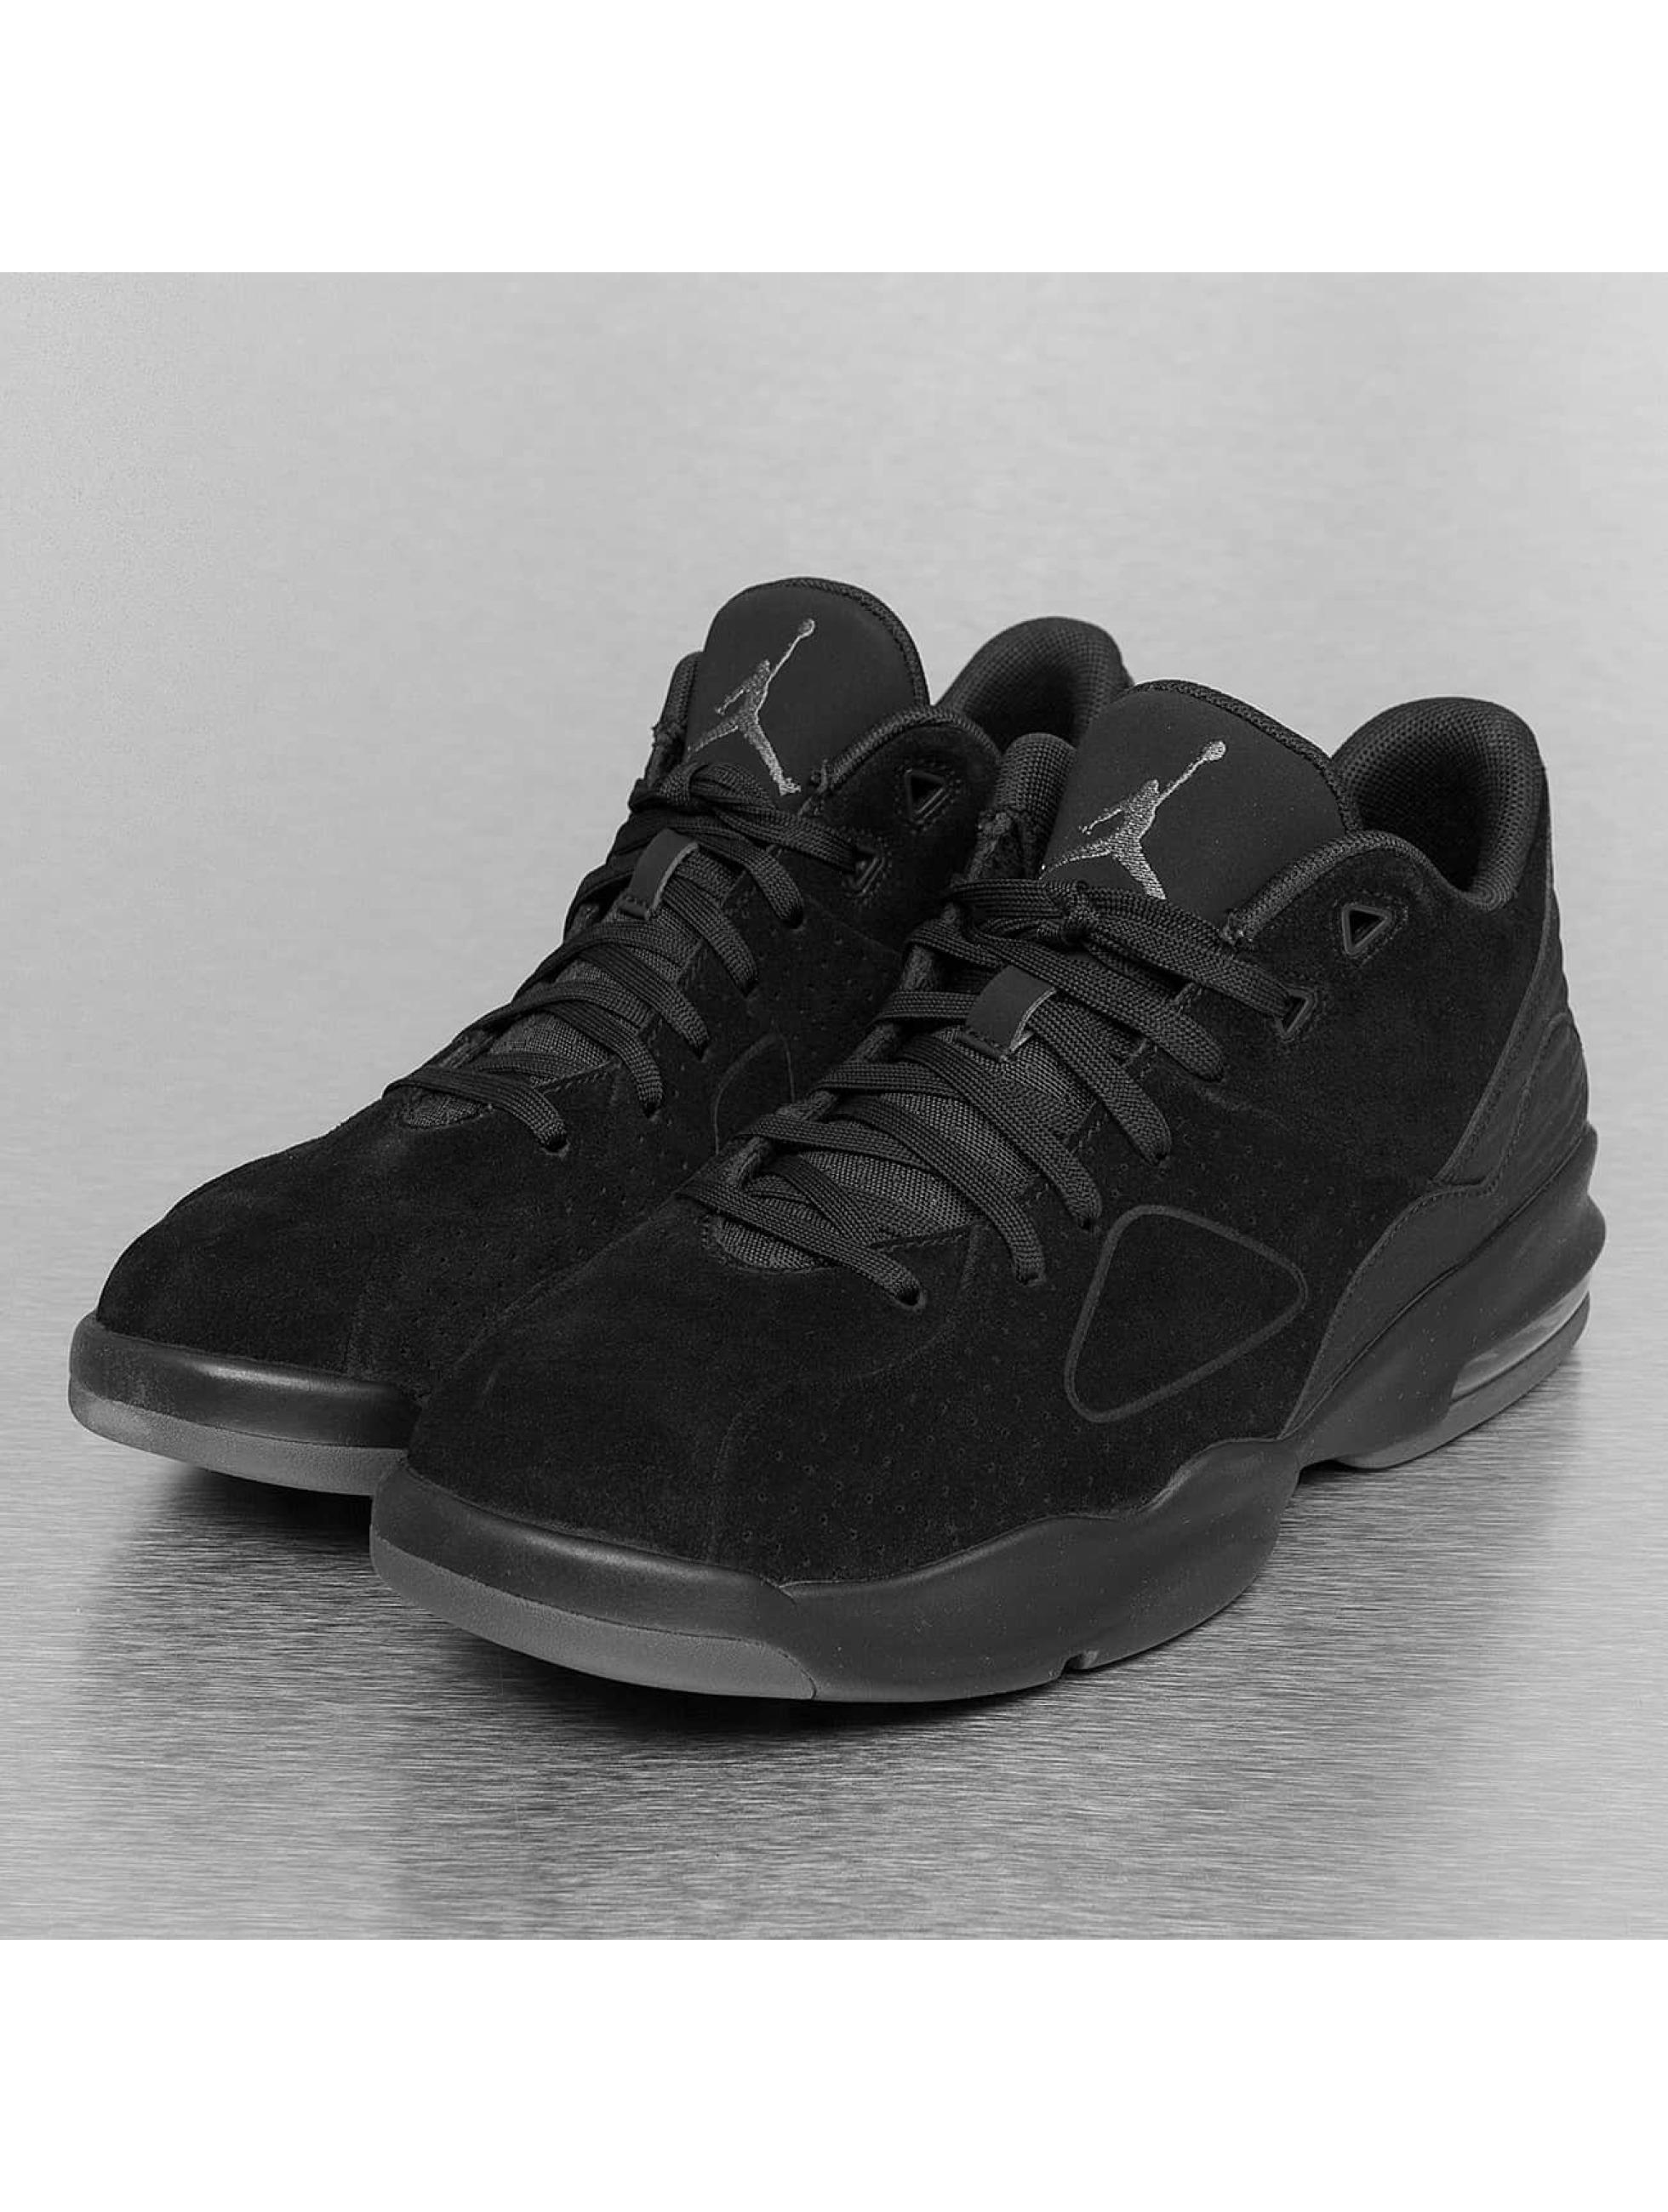 Nike Jordan Rot Schwarz